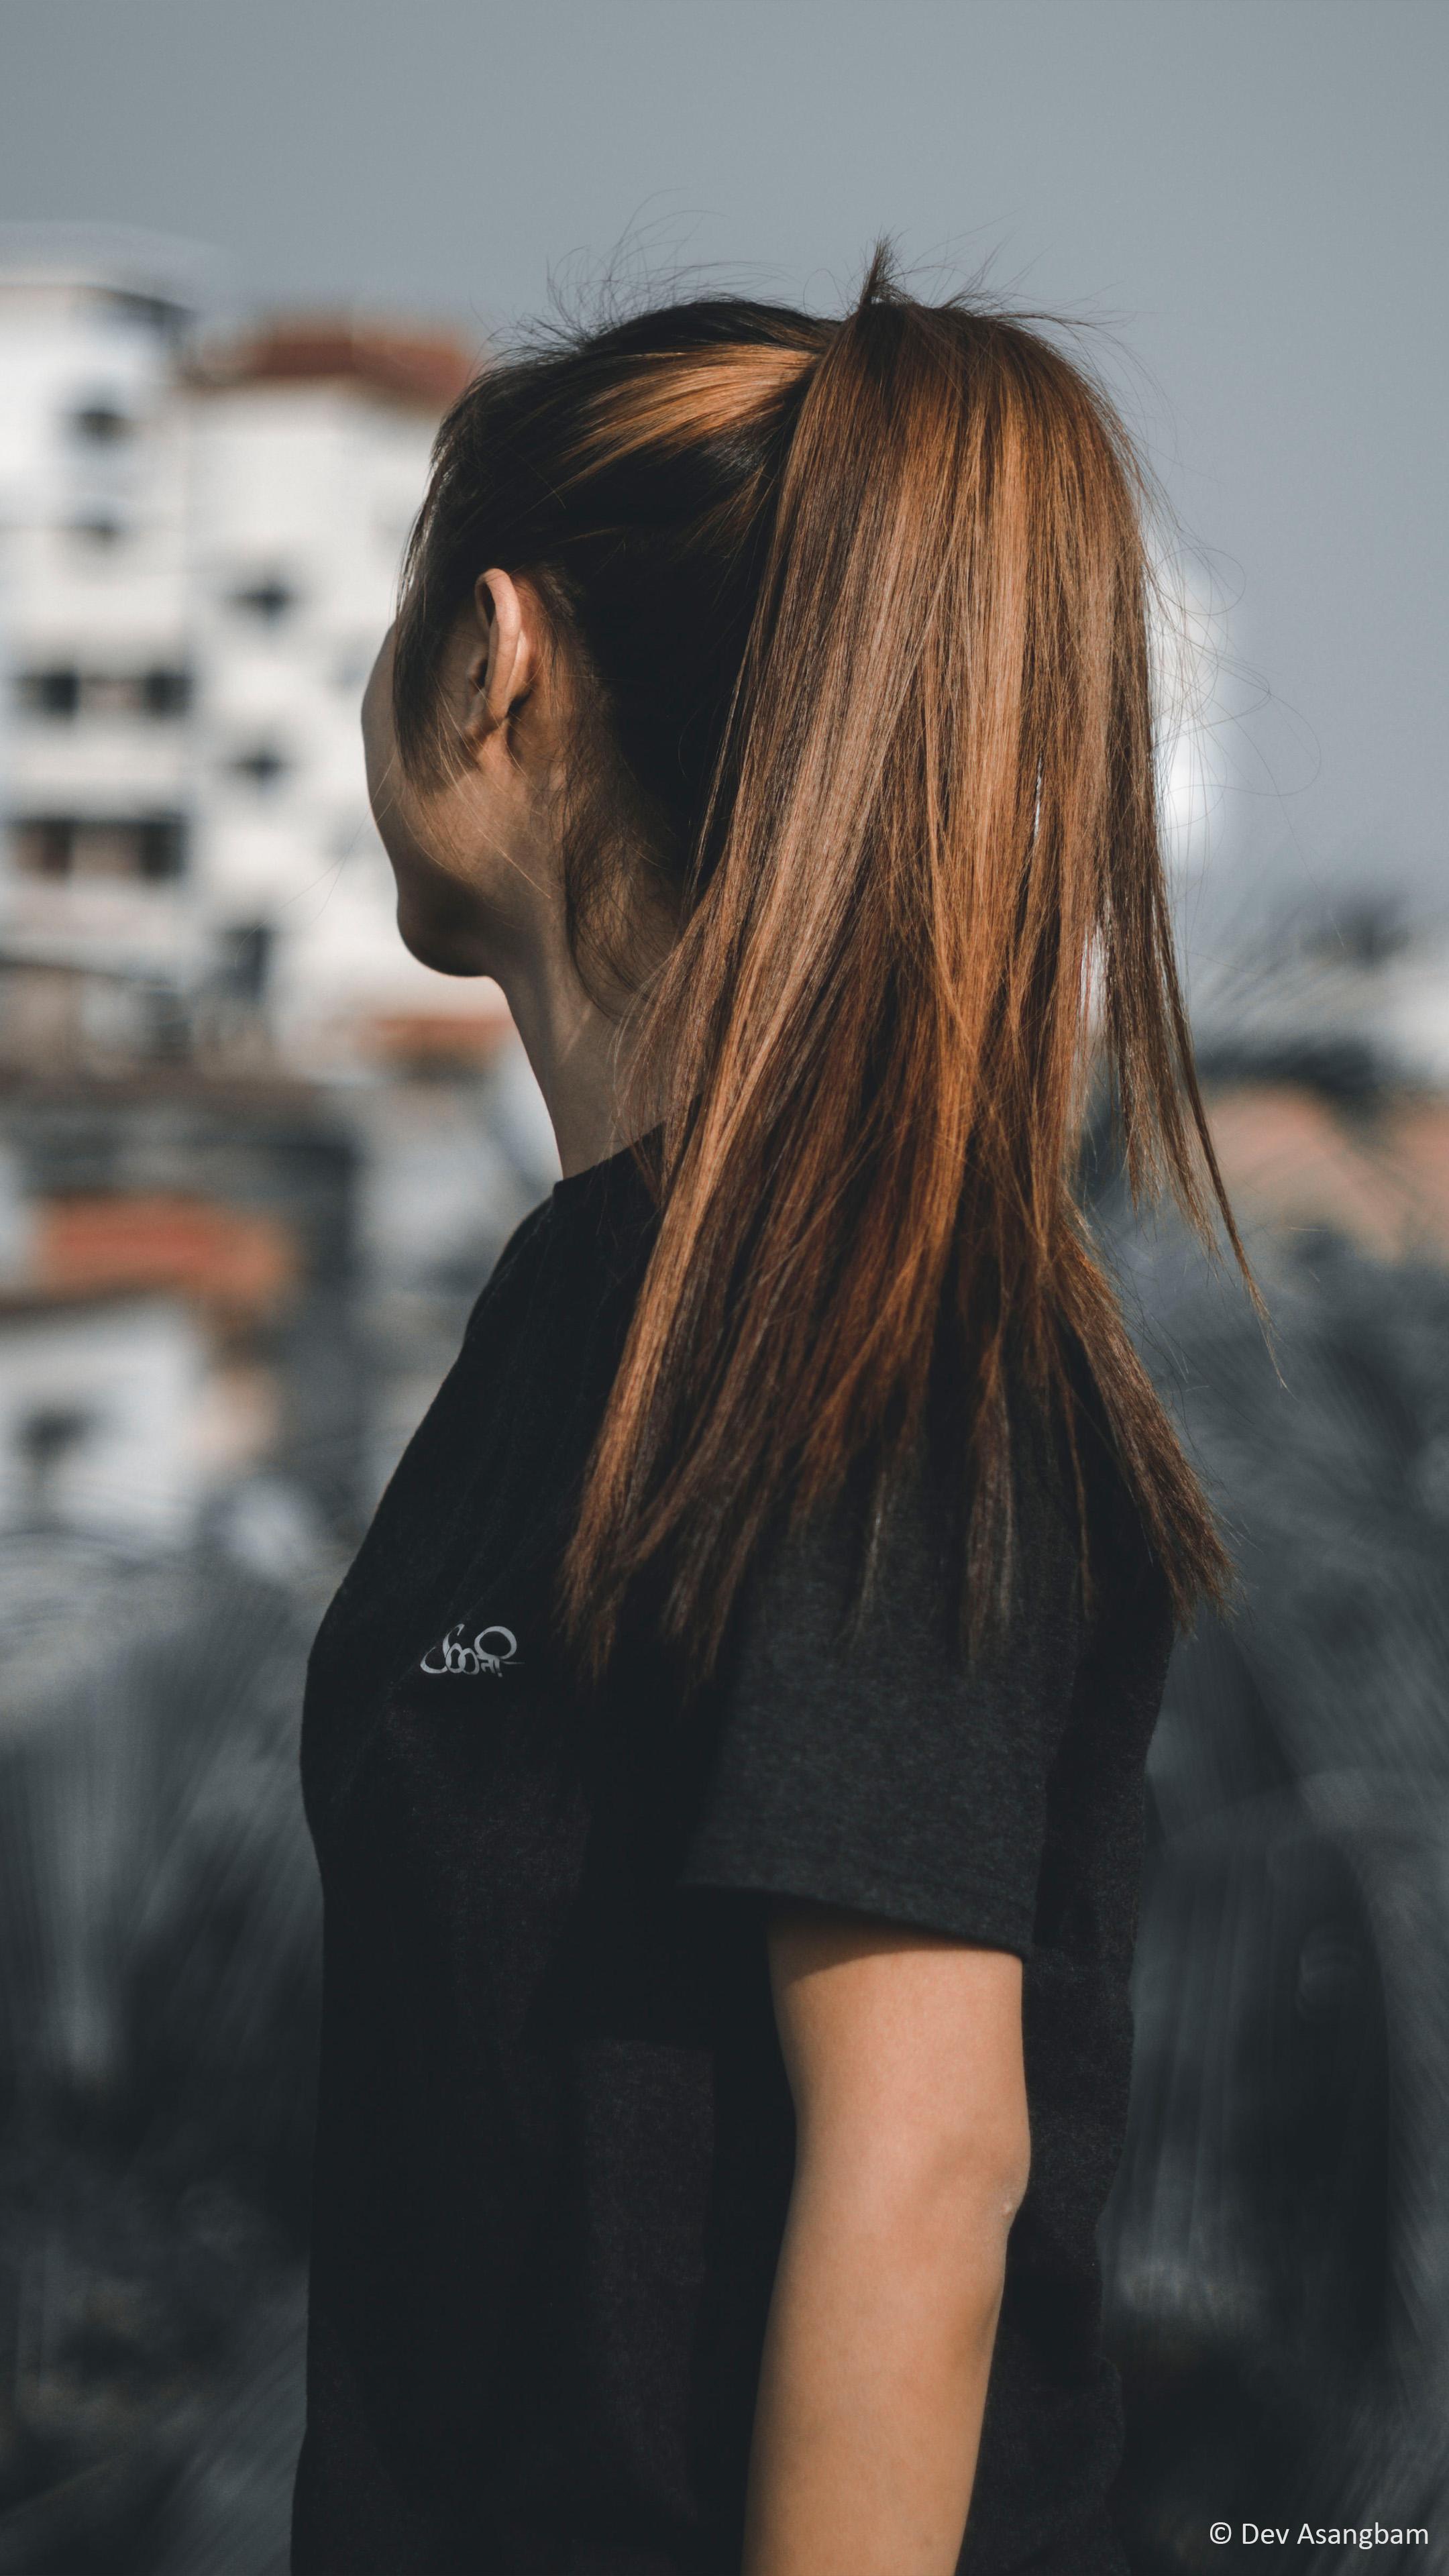 Girl Brown Hair Highlight Photography 4k Ultra Hd Mobile Wallpaper